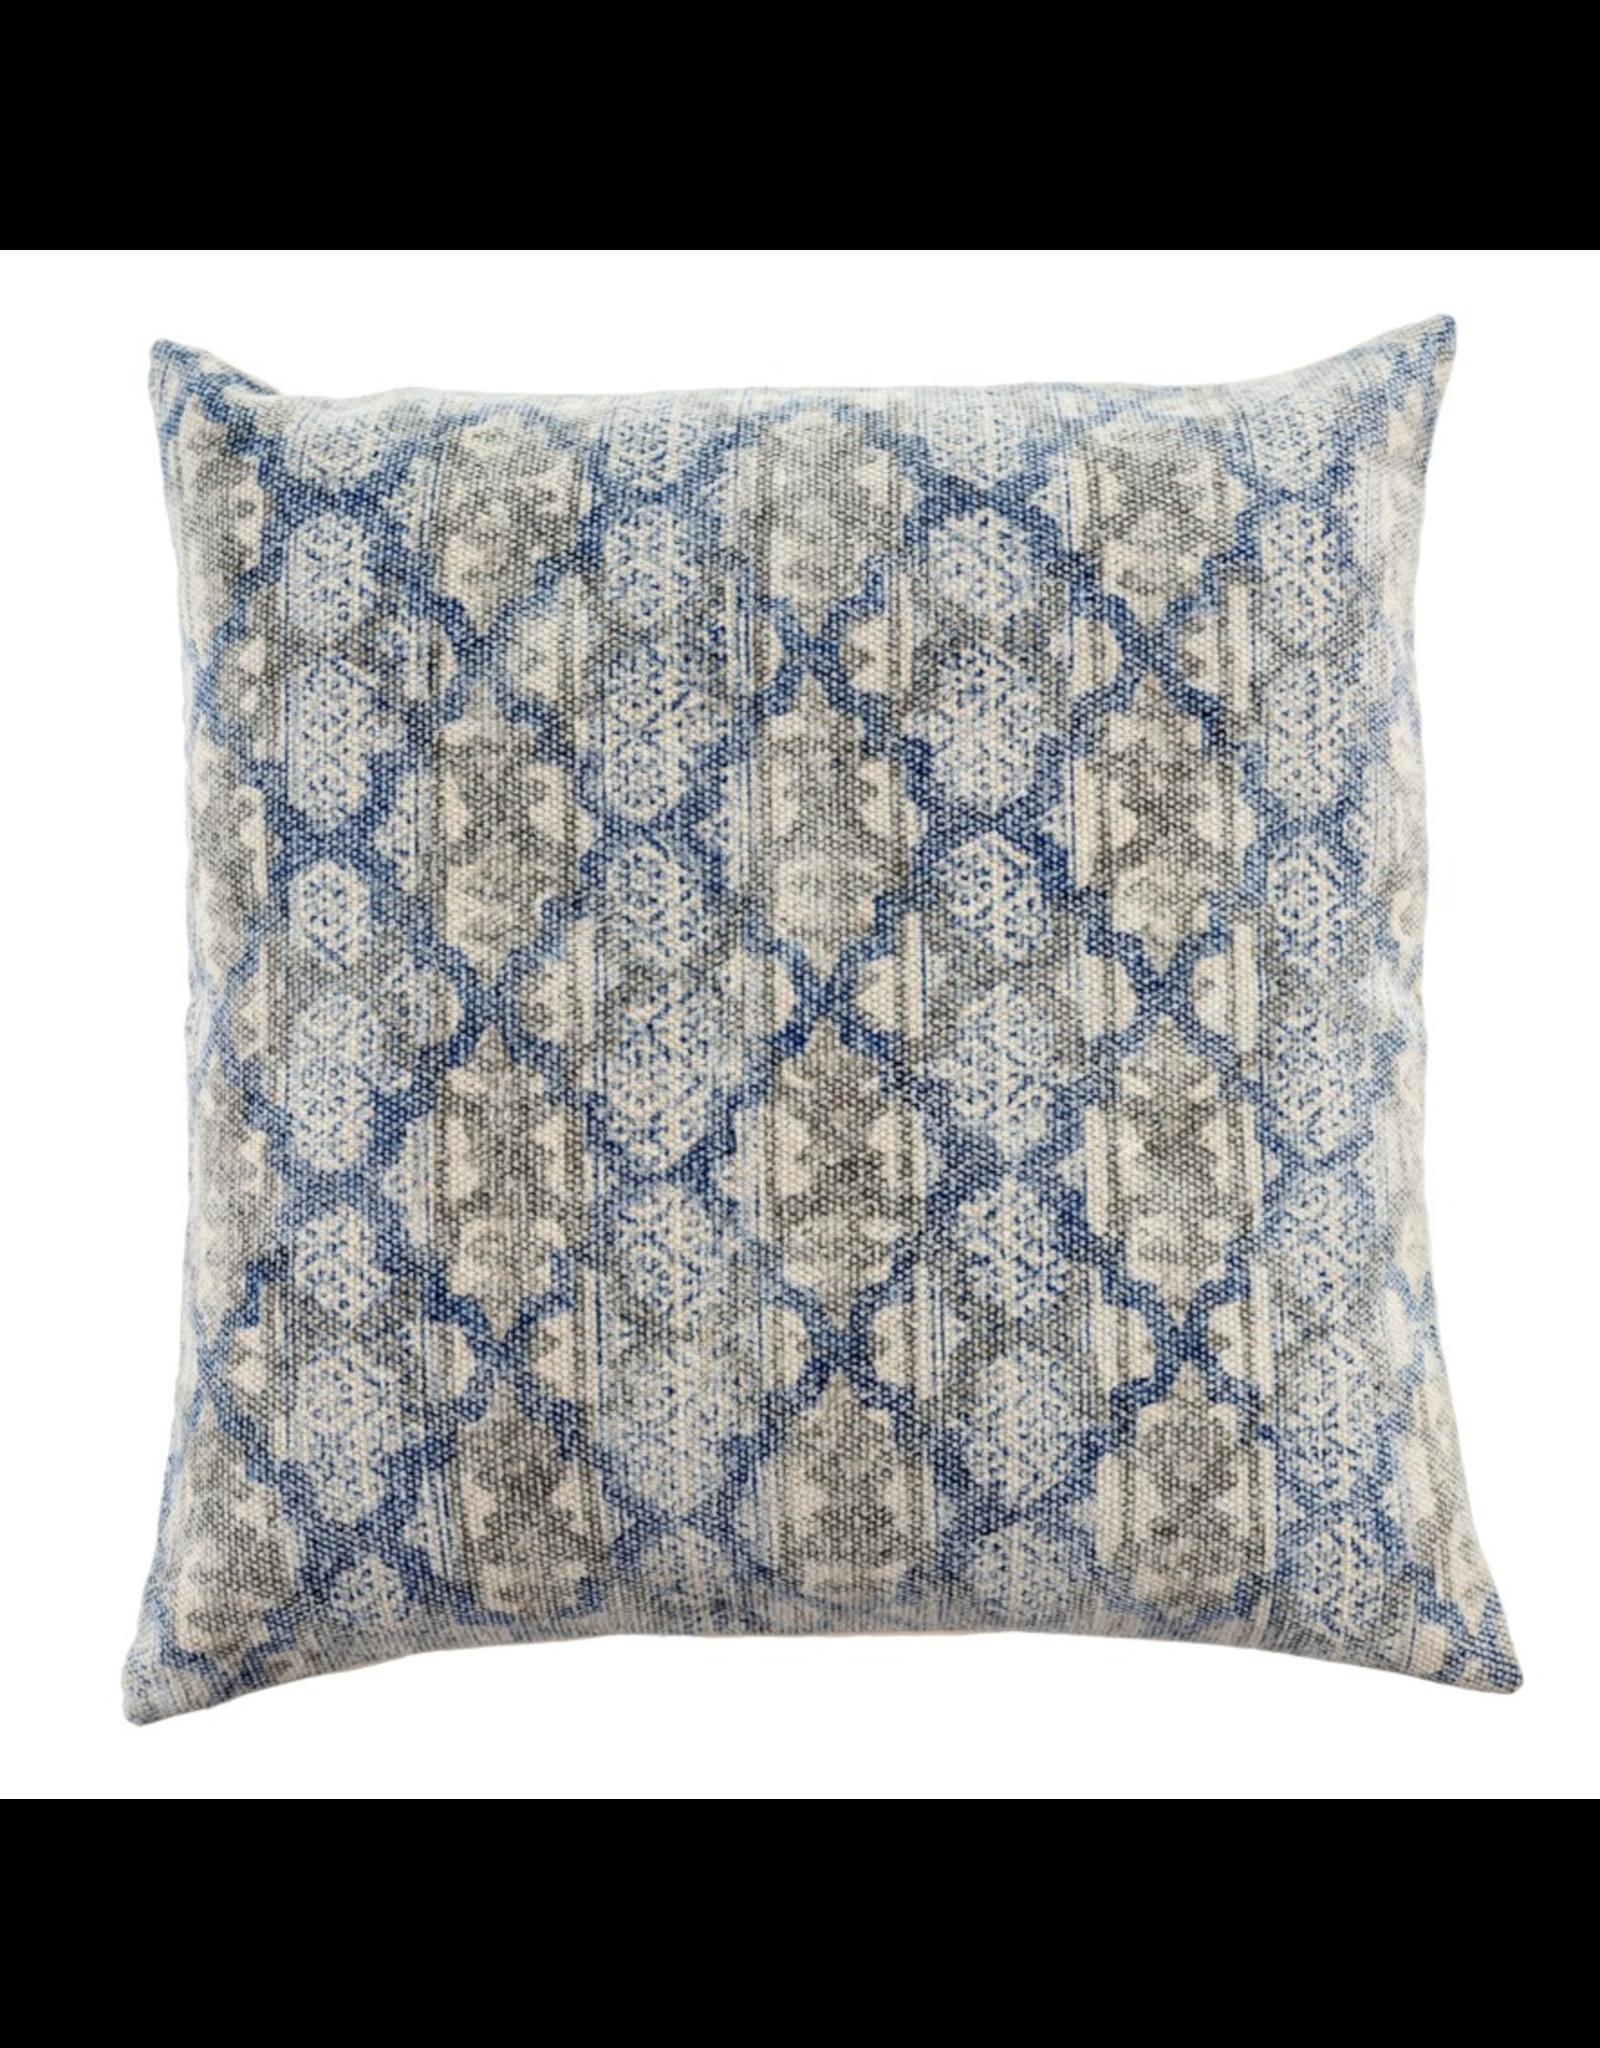 24x24 Stonewashed Blue Pillow